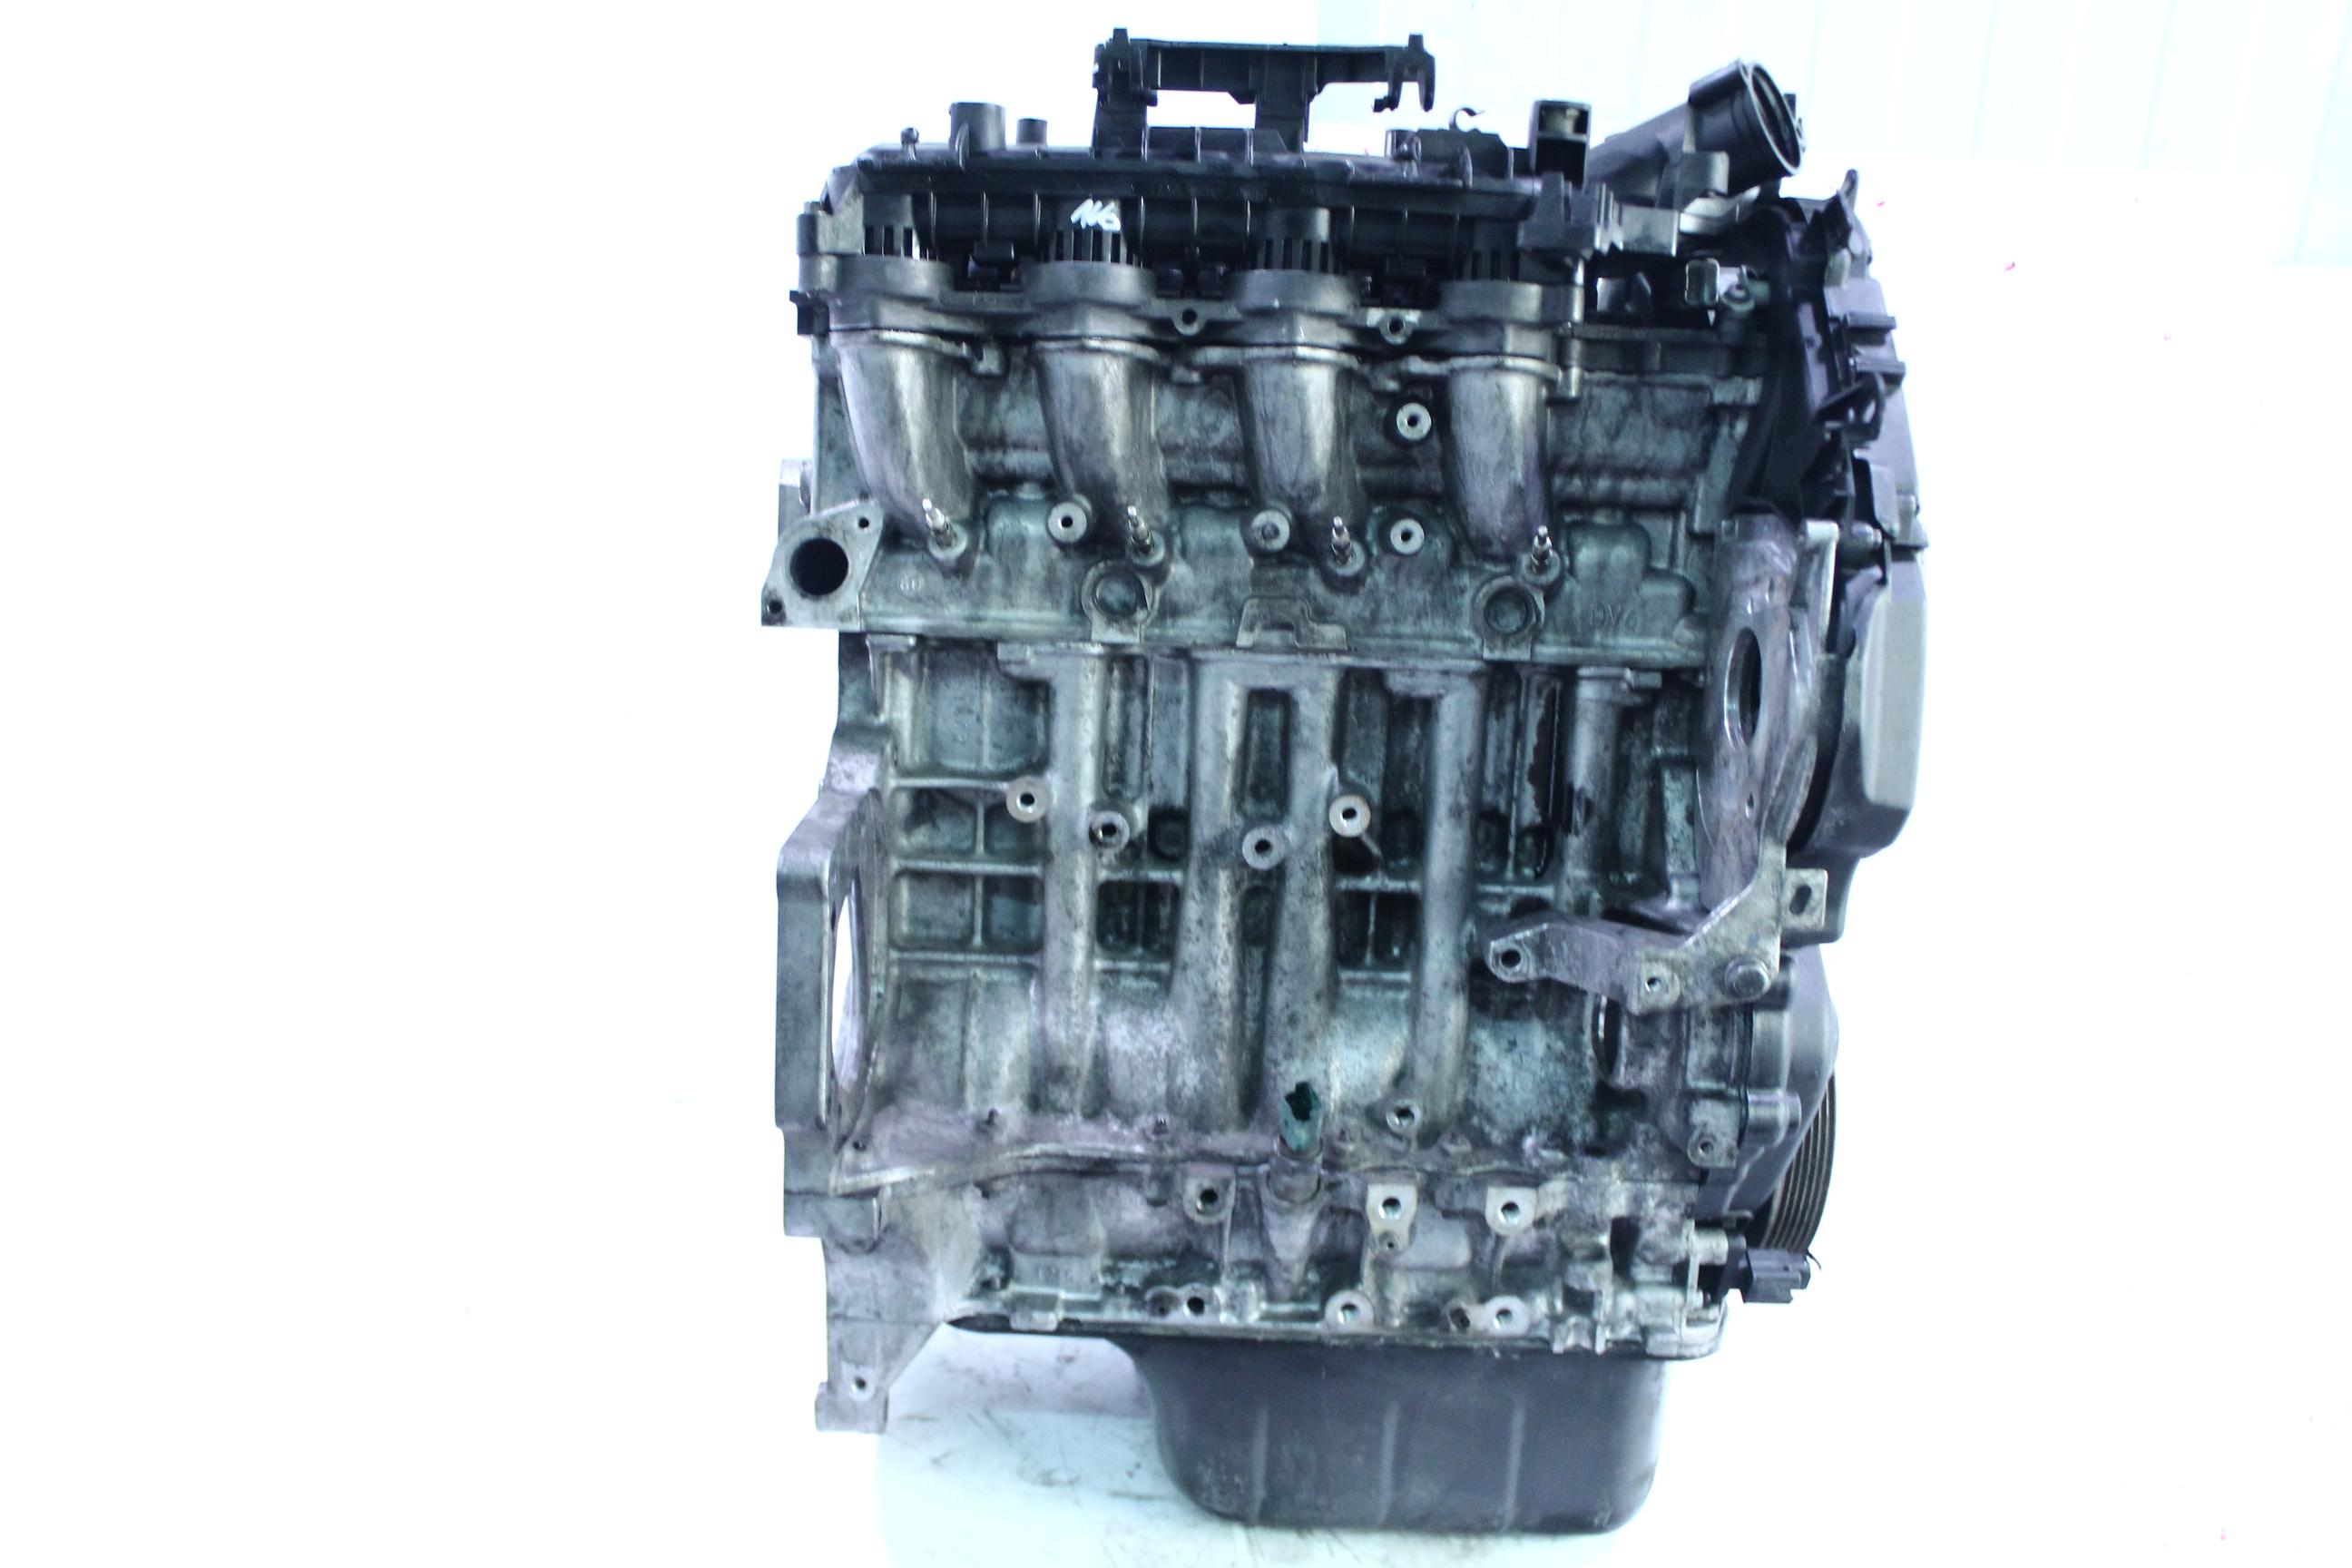 Motor 2010 Citroen Peugeot Berlingo Partner 1,6 HDi Diesel 75 9HT DV6BTED4 9H03